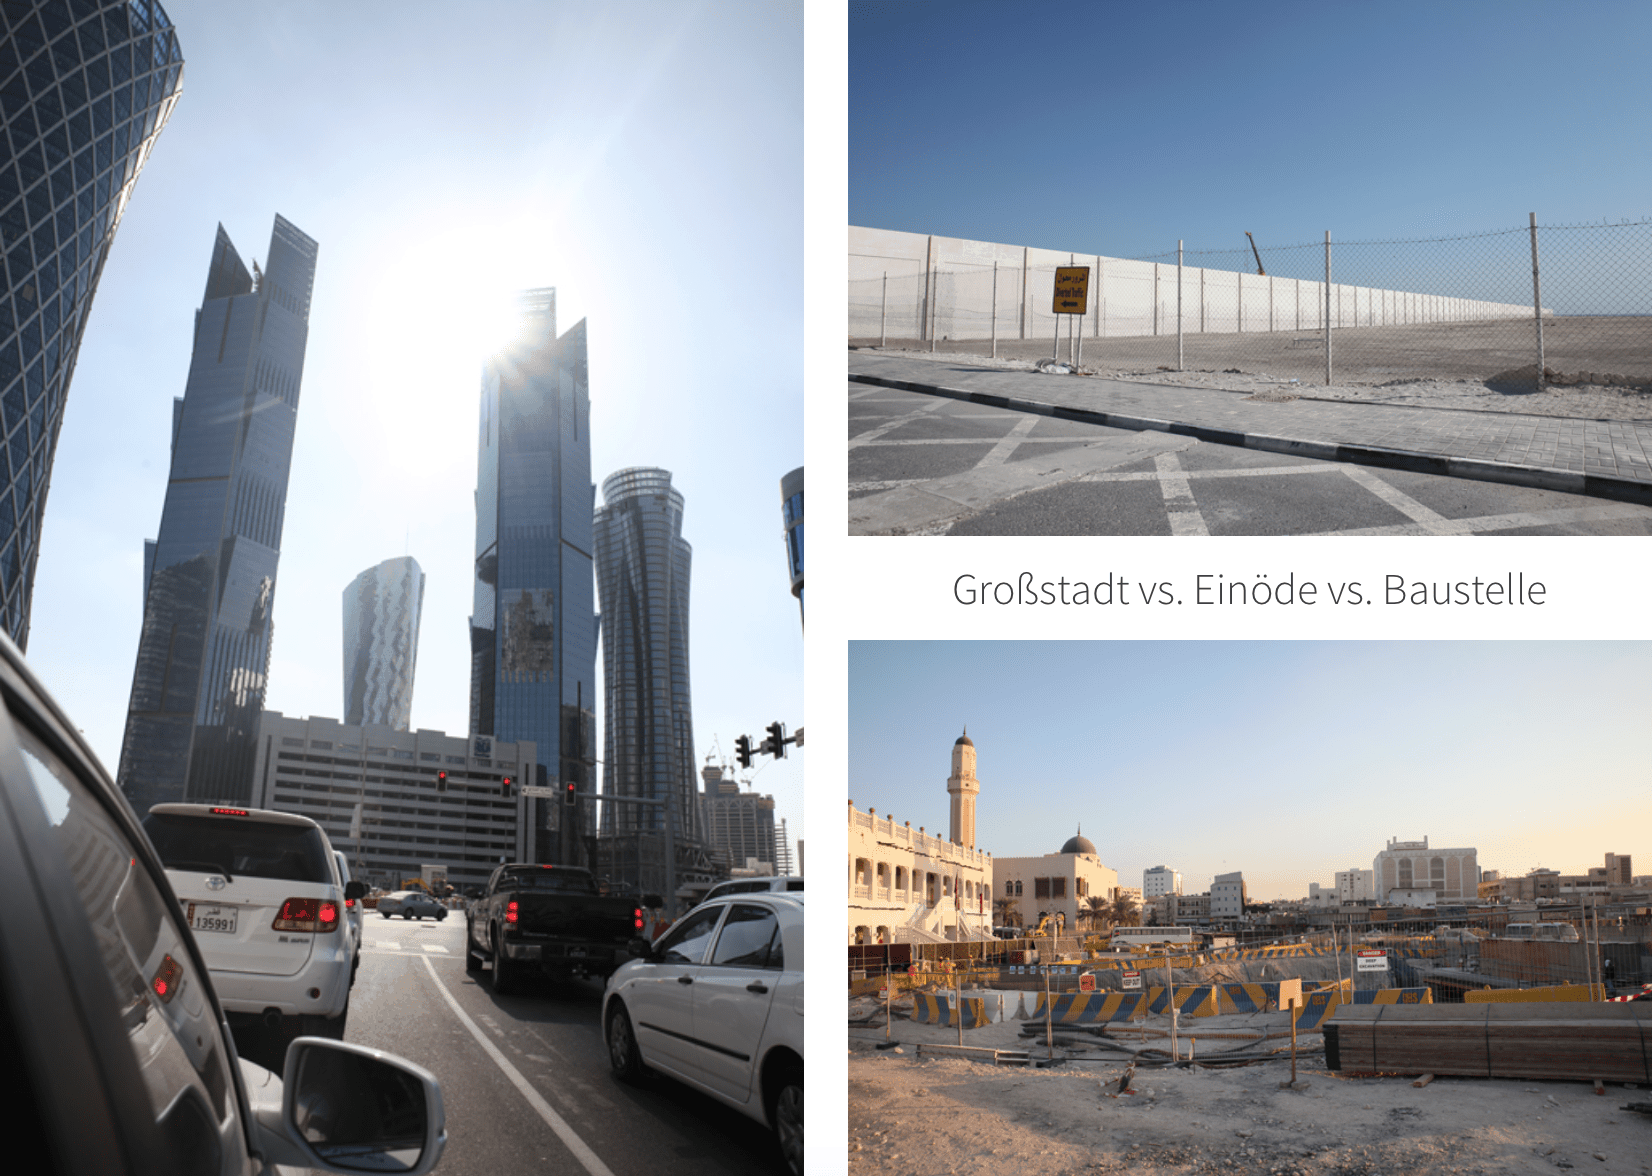 Doha Baustelle Großstadt